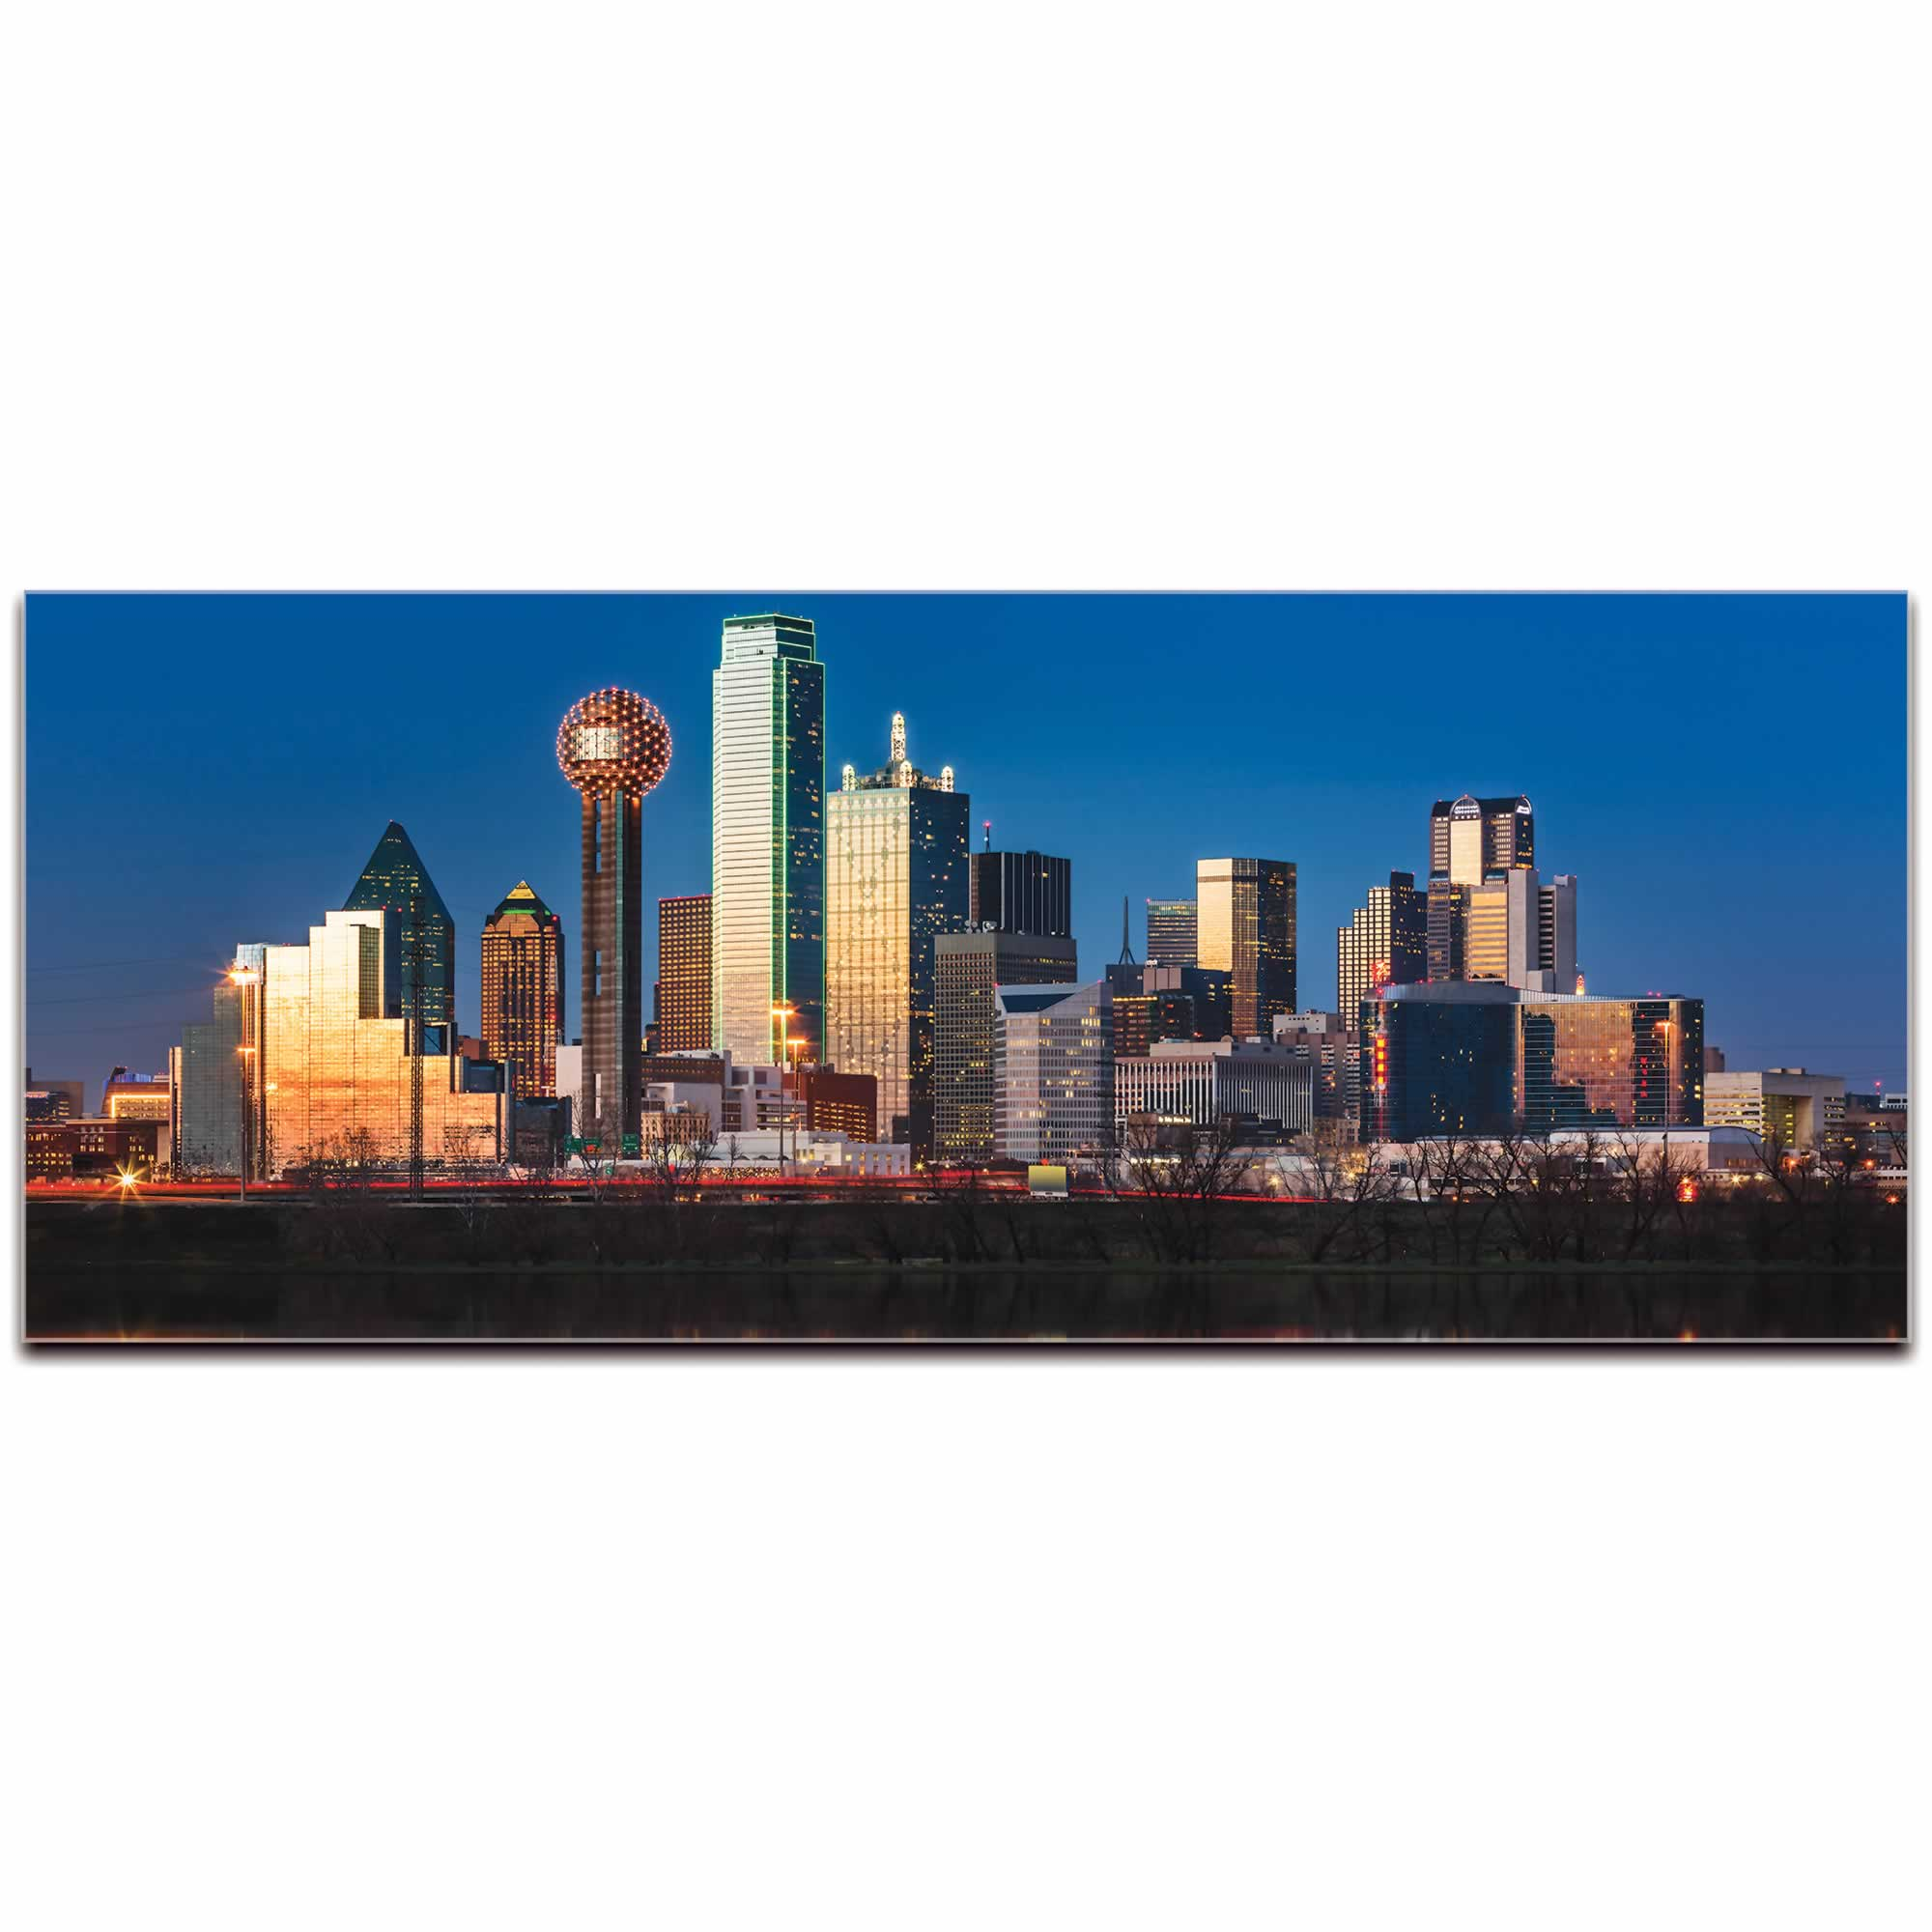 Dallas City Skyline - Urban Modern Art, Designer Home Decor, Cityscape Wall Artwork, Trendy Contemporary Art